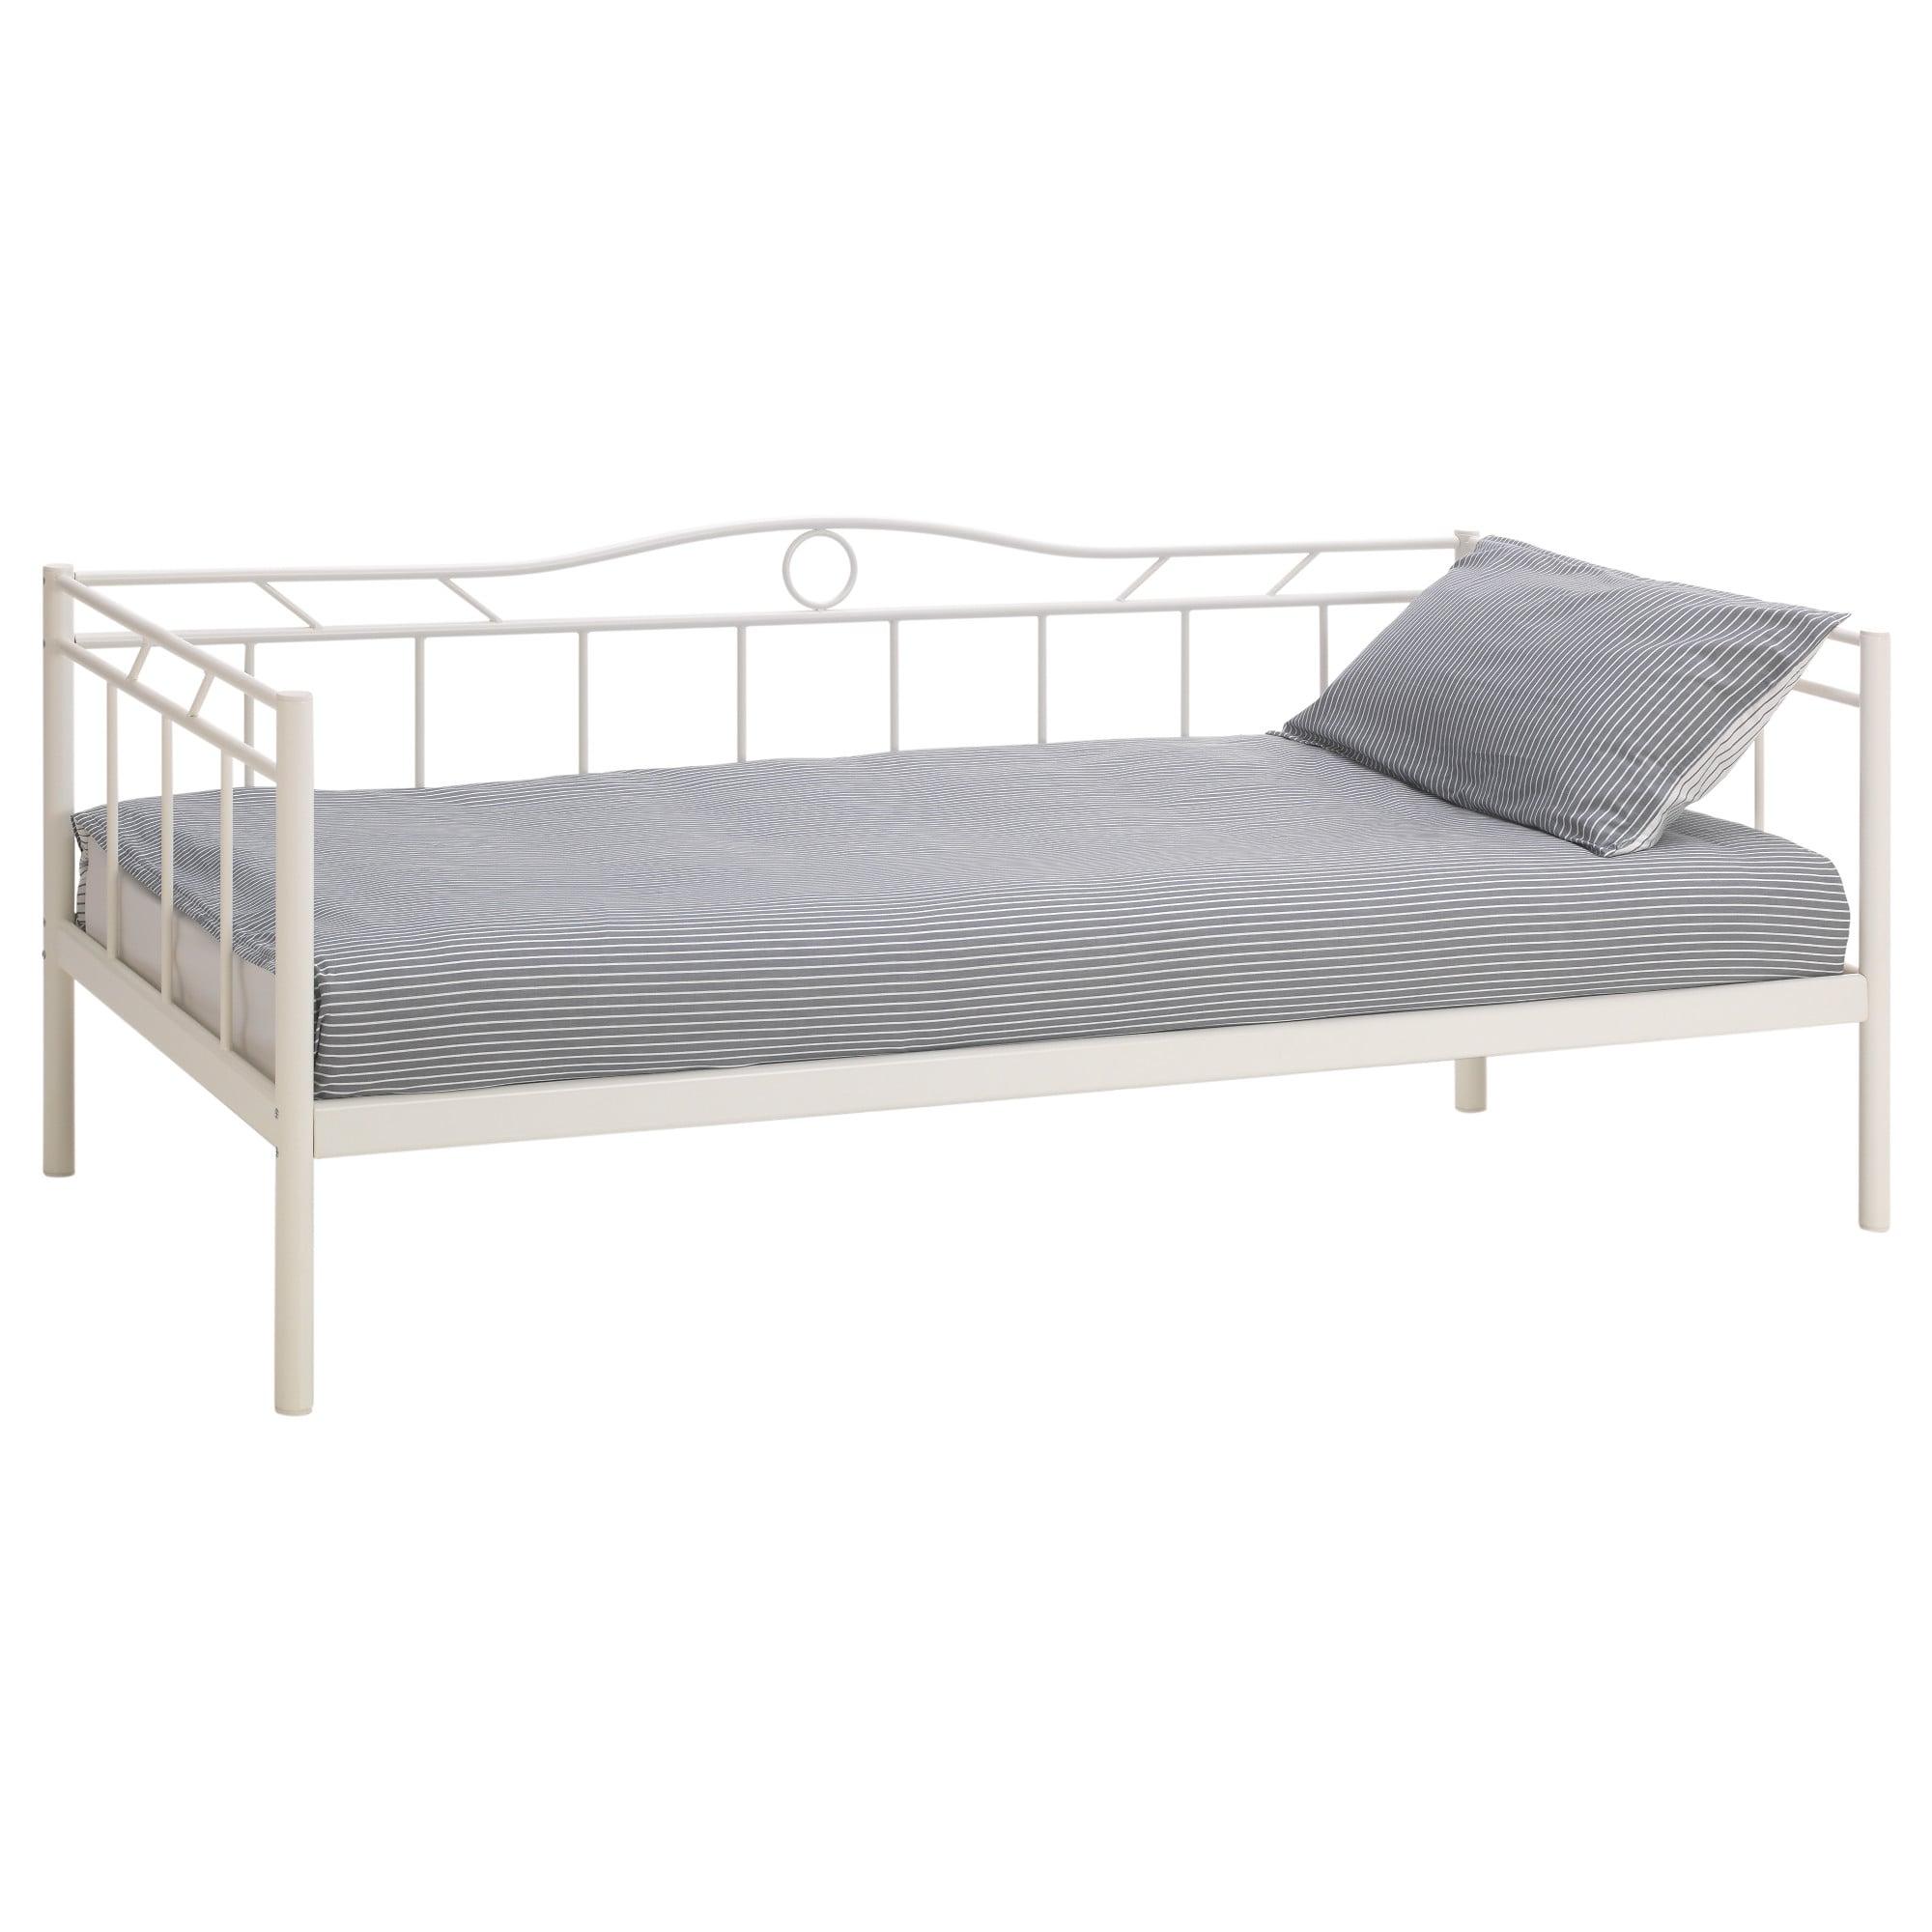 Ikea sofas Camas Whdr Camas Supletorias Y Divanes De Ikea Catalogomueblesde